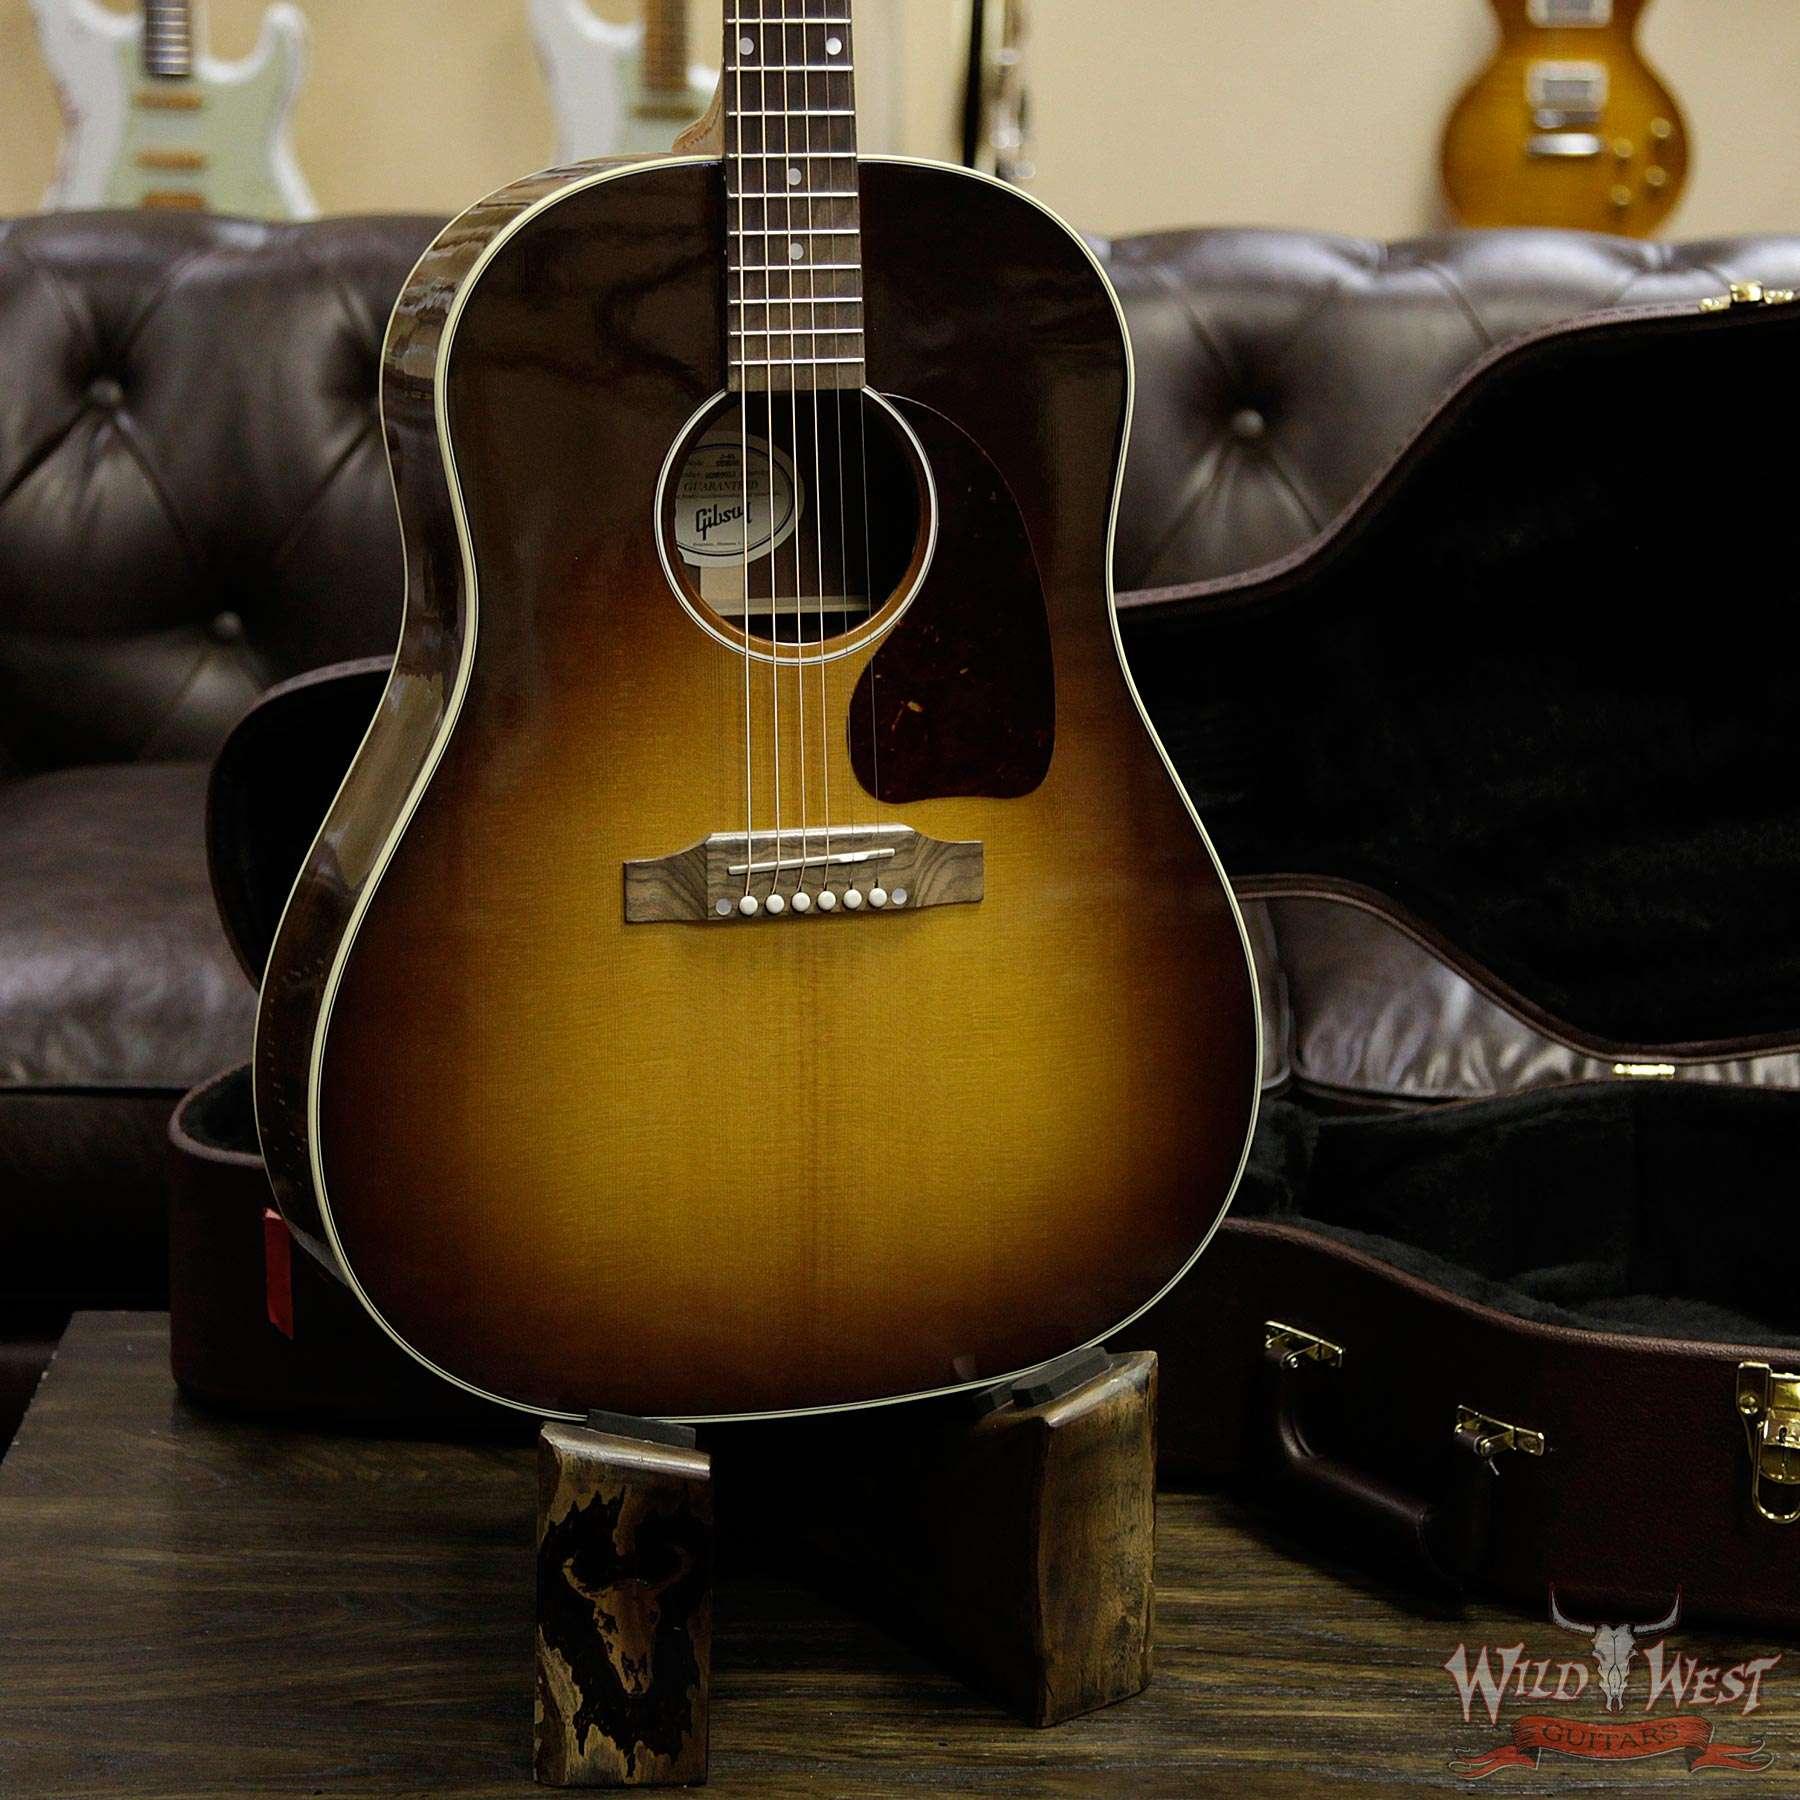 gibson montana j 45 studio walnut burst electric acoustic guitar wild west guitars. Black Bedroom Furniture Sets. Home Design Ideas